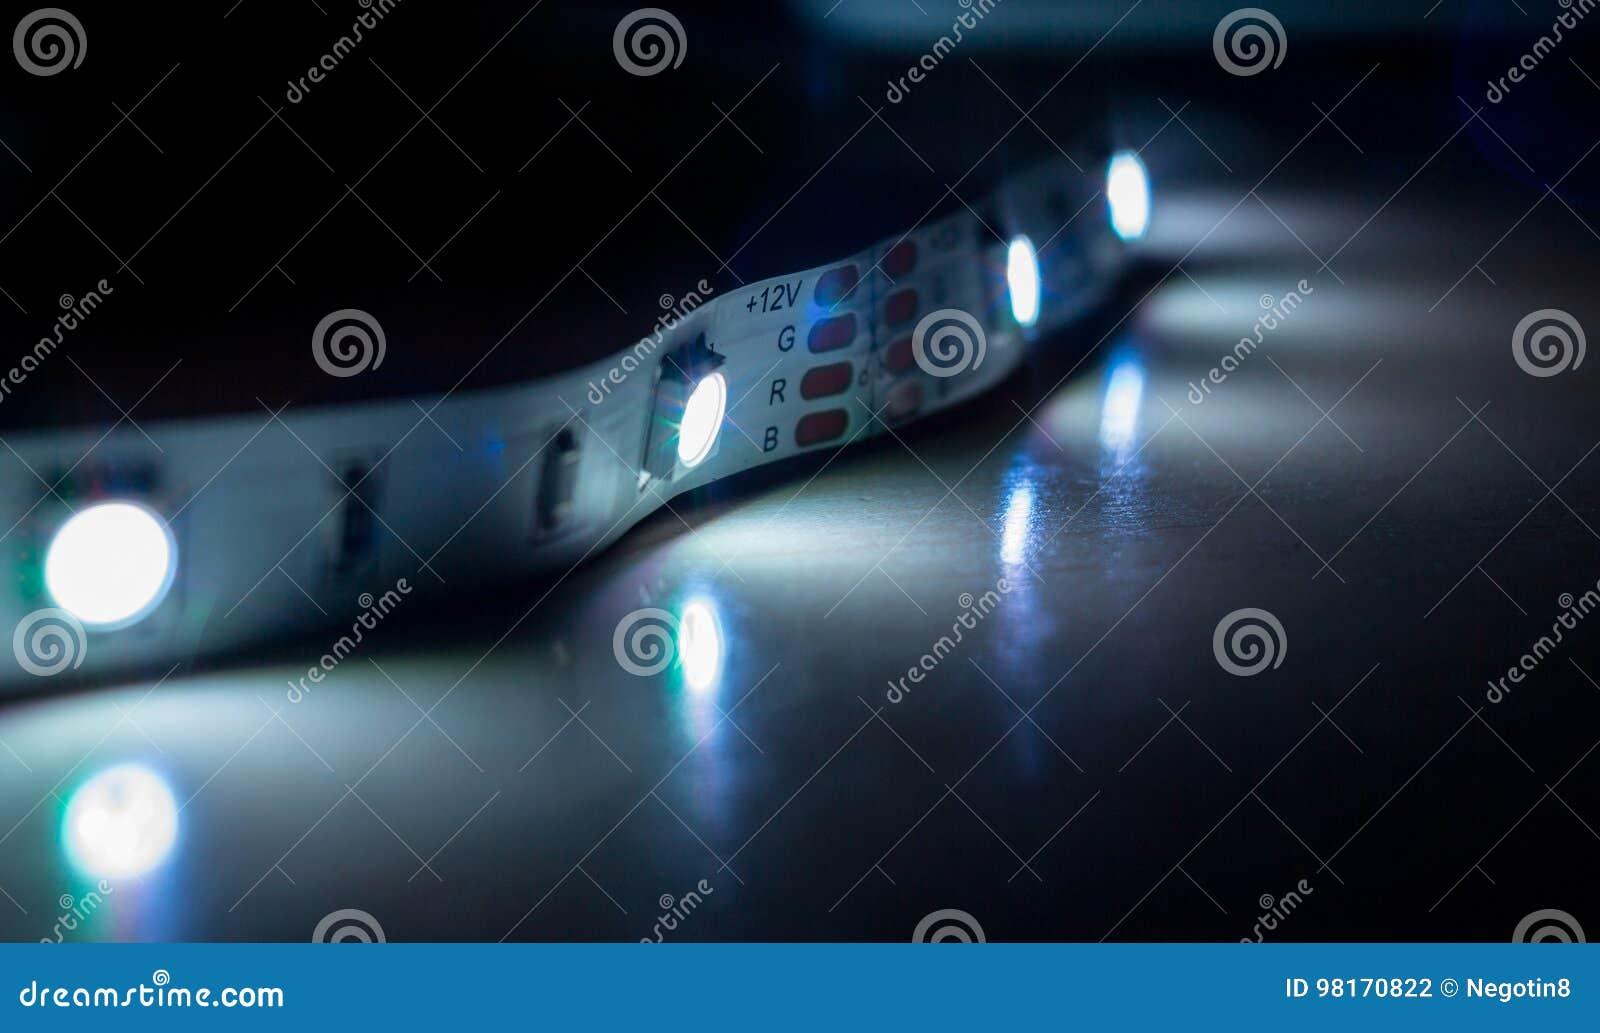 Led strip lights stock photo image of electricity green 98170822 led strip lights royalty free stock photo aloadofball Gallery